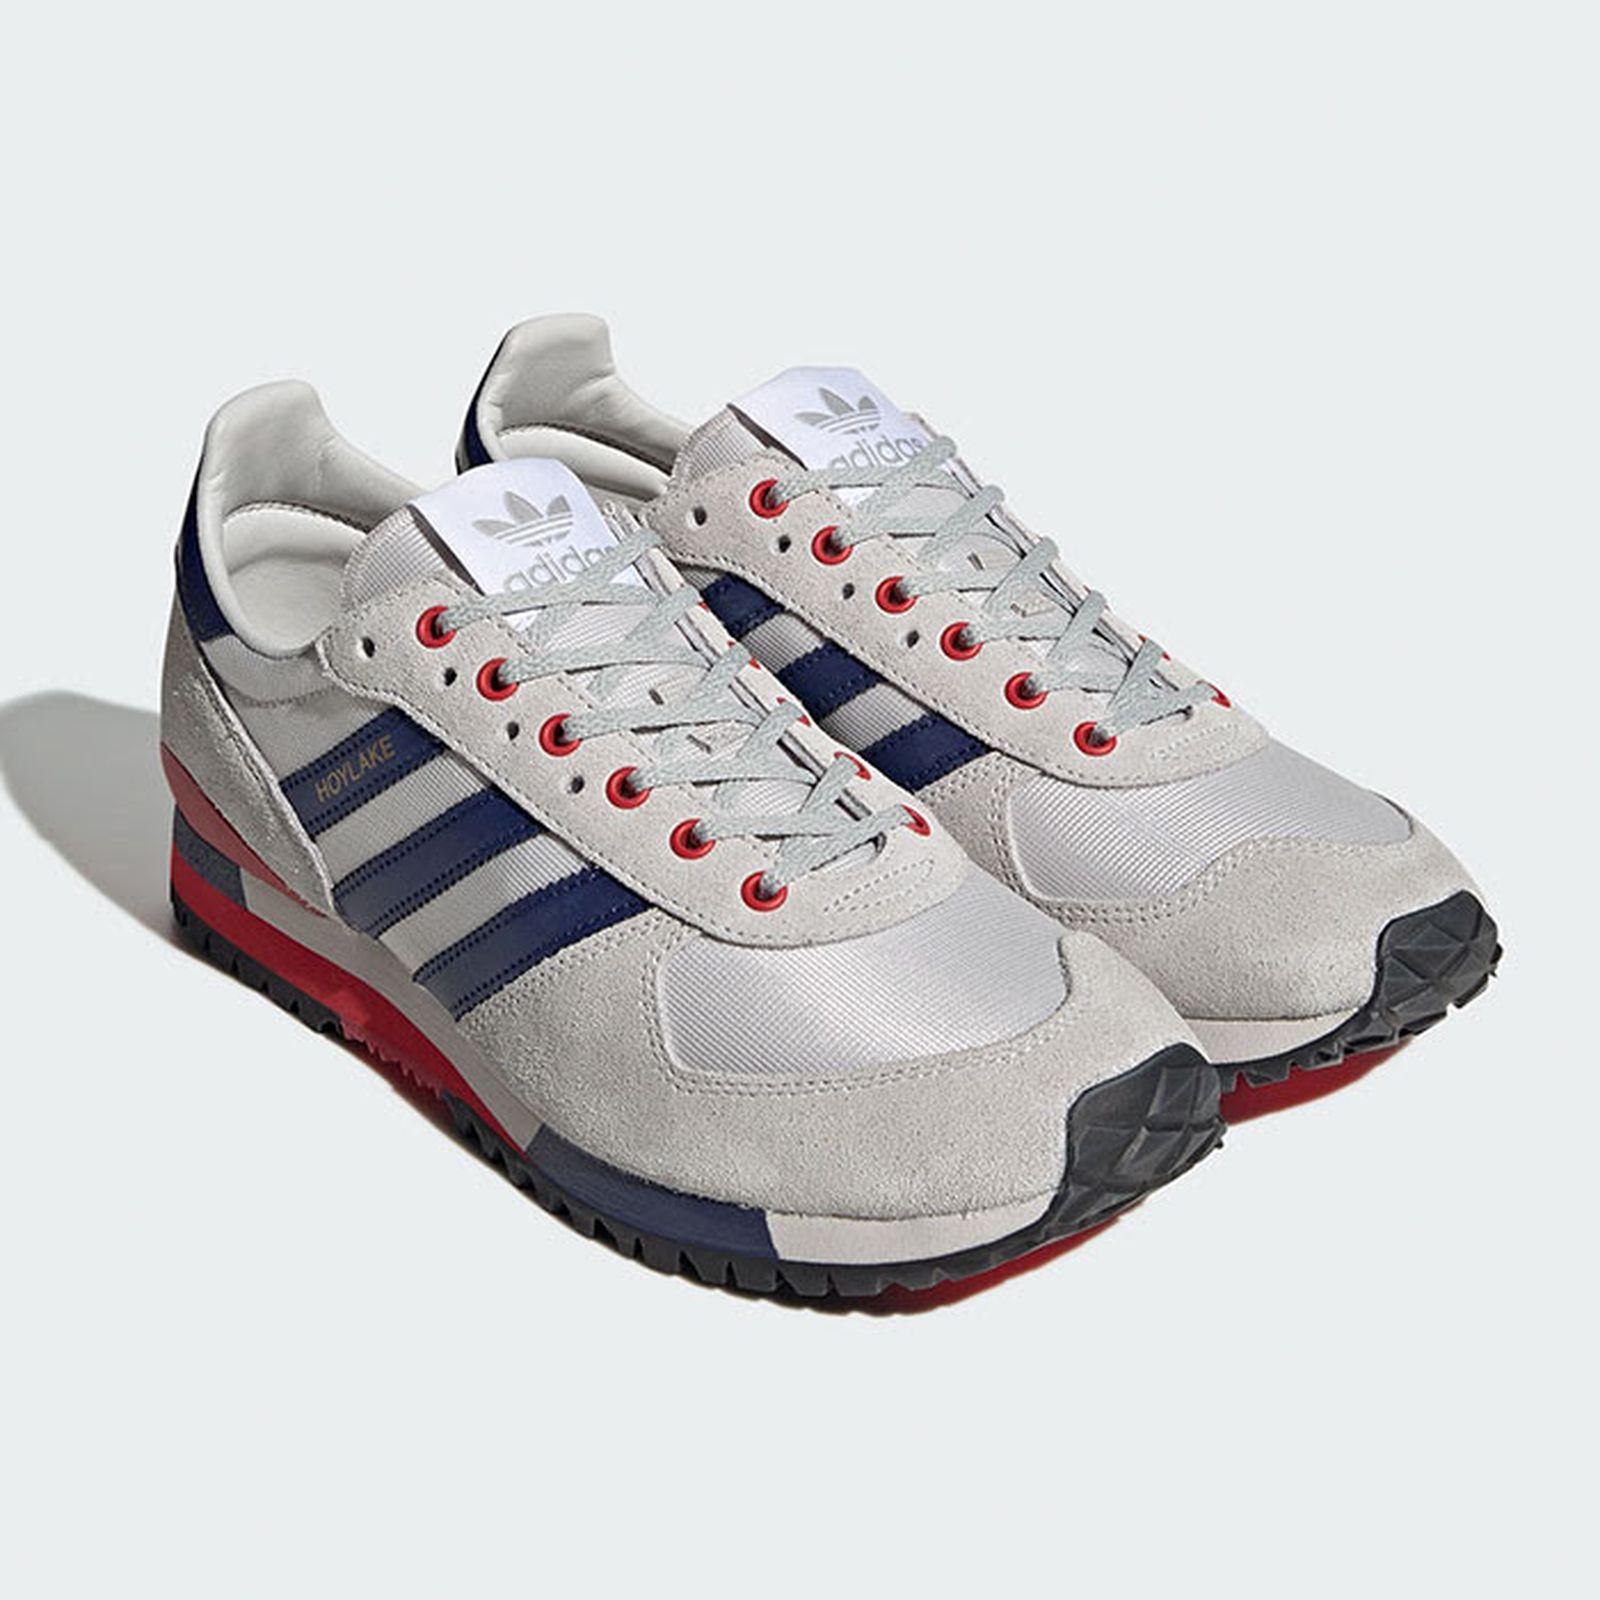 adidas-spezial-ss21-release-info-13